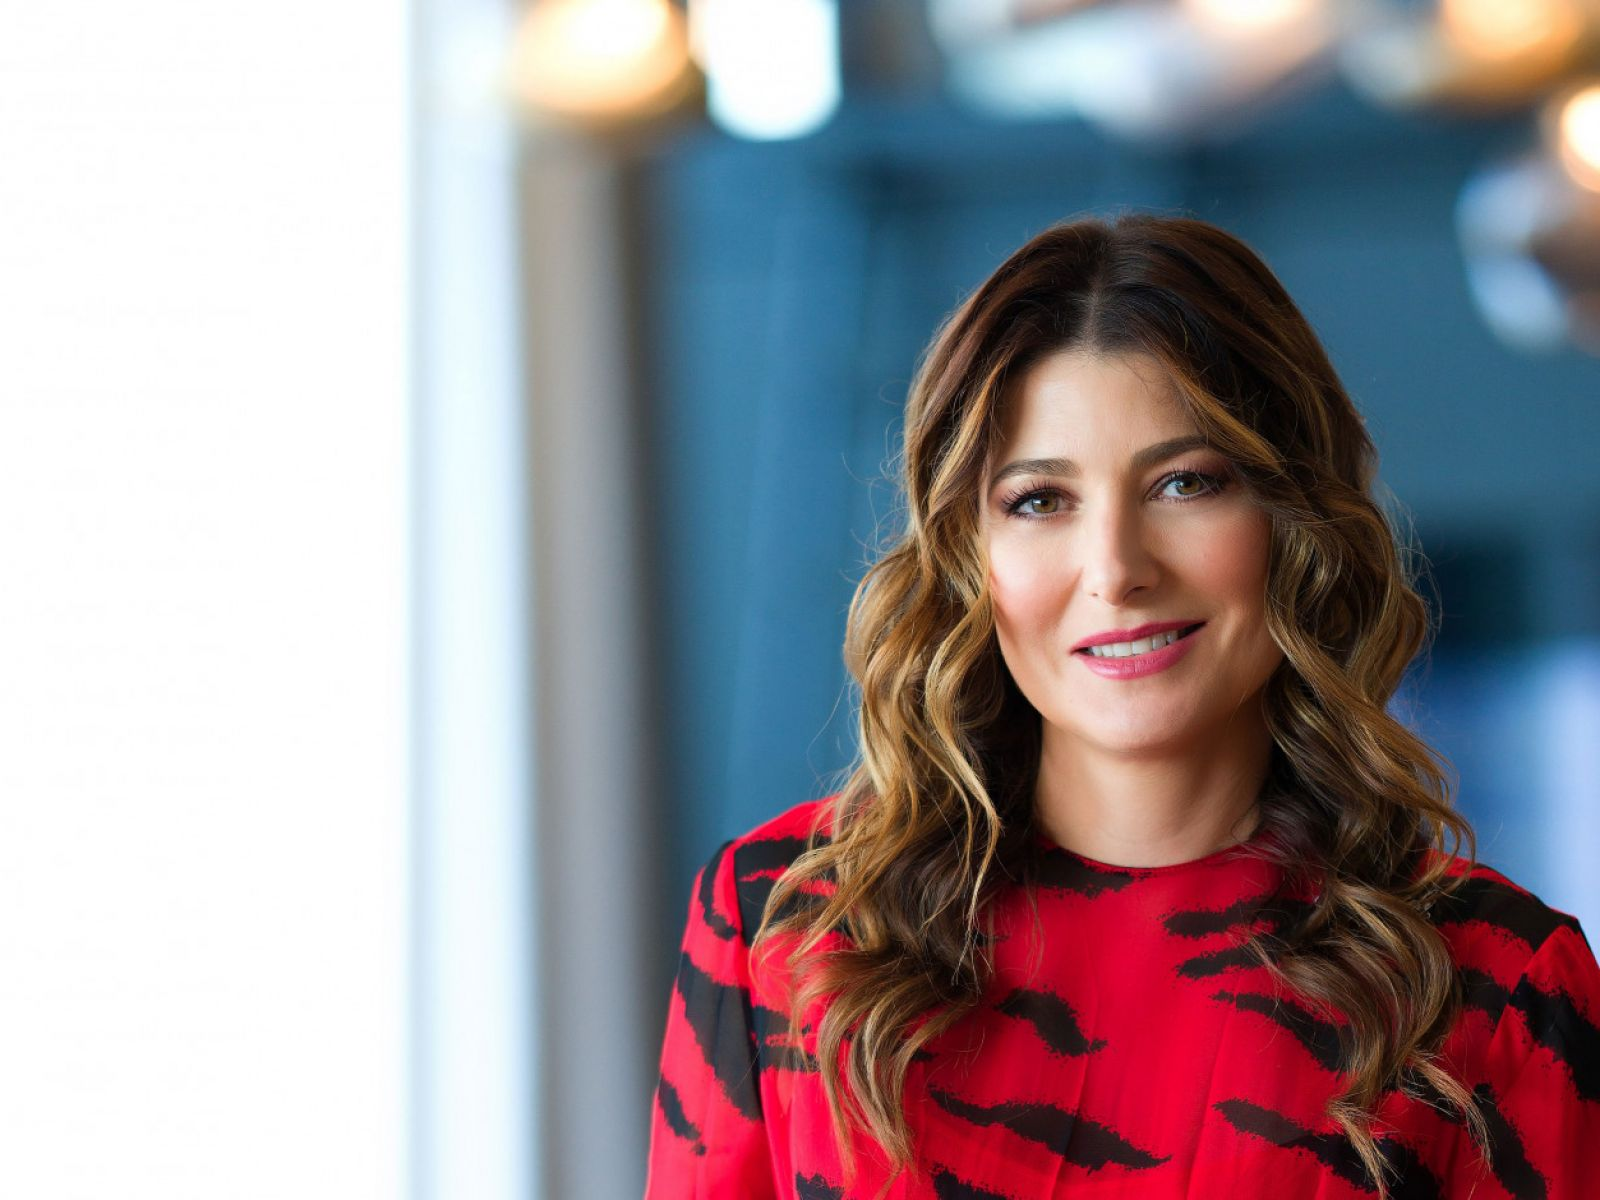 Cristina Căpitanu, Lemon Interior Design co-founder, for Forbes